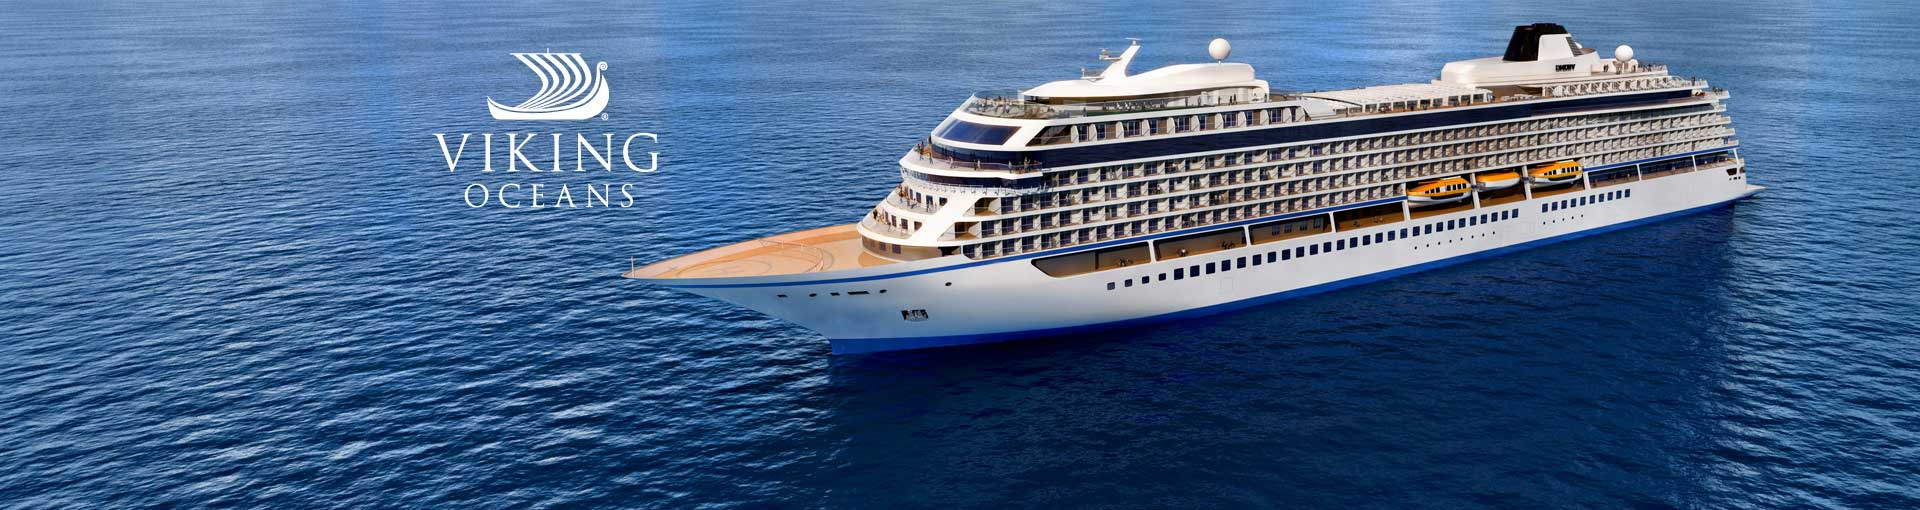 viking-ocean-cruises-overview-banner